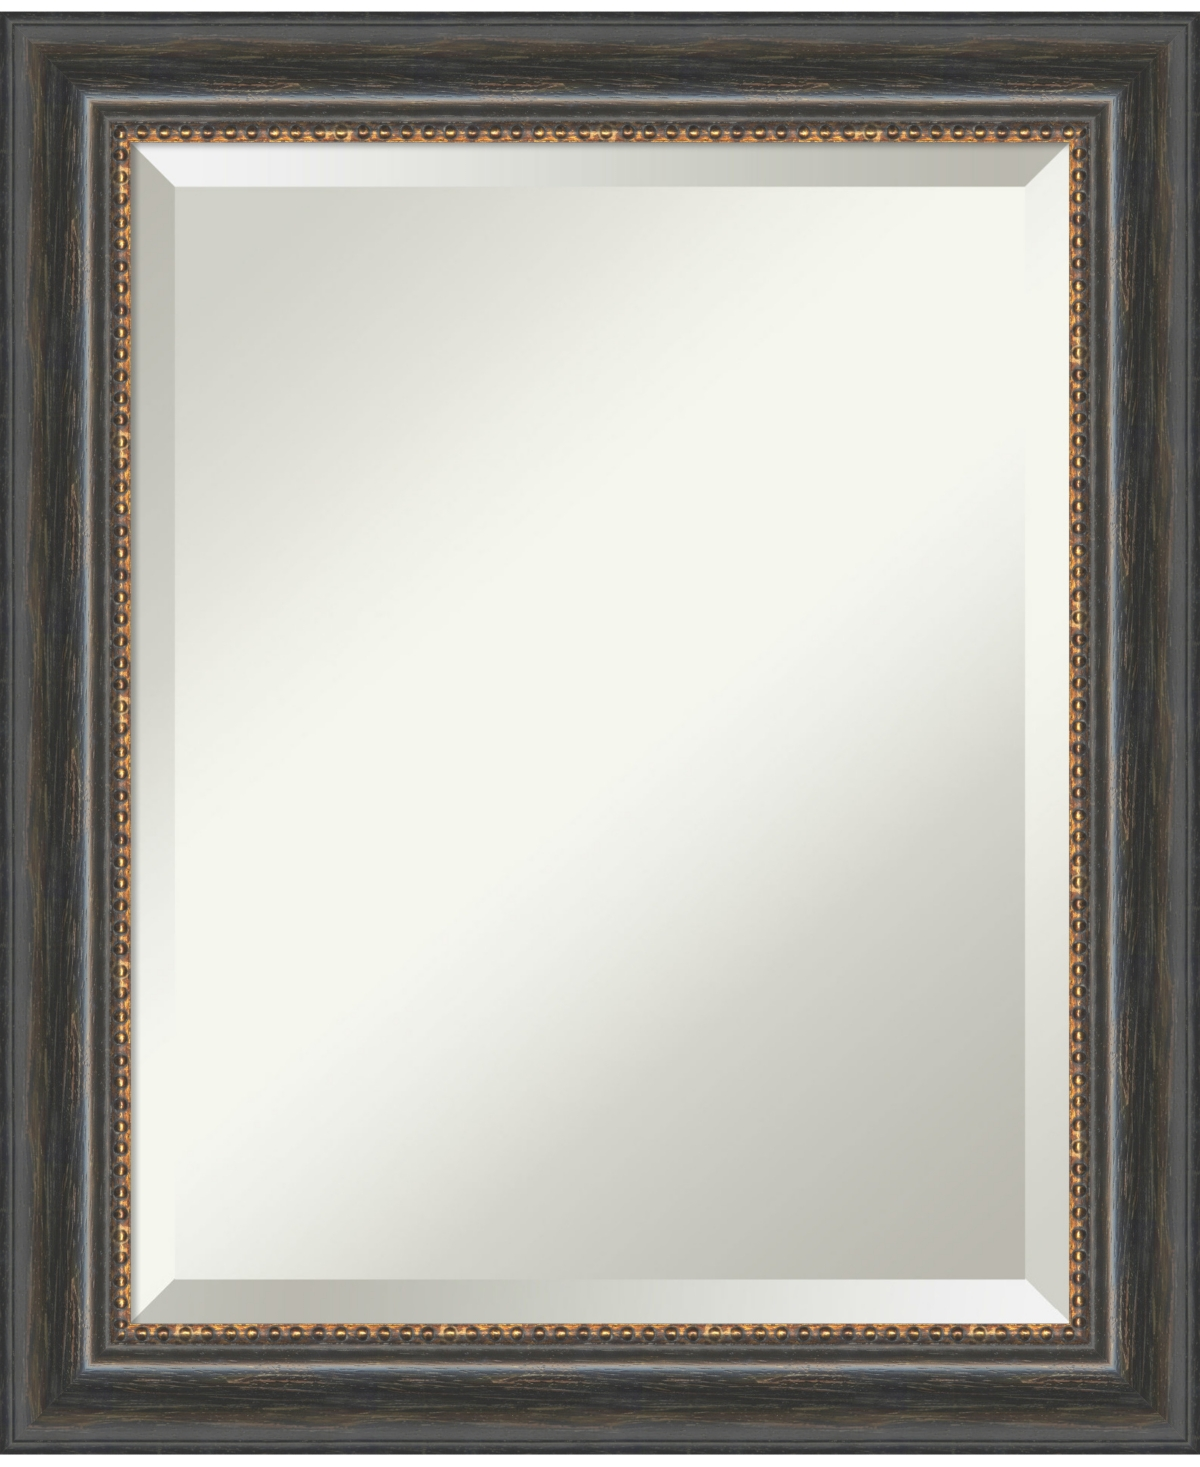 Amanti Art Tuscan Rustic 20x24 Bathroom Mirror